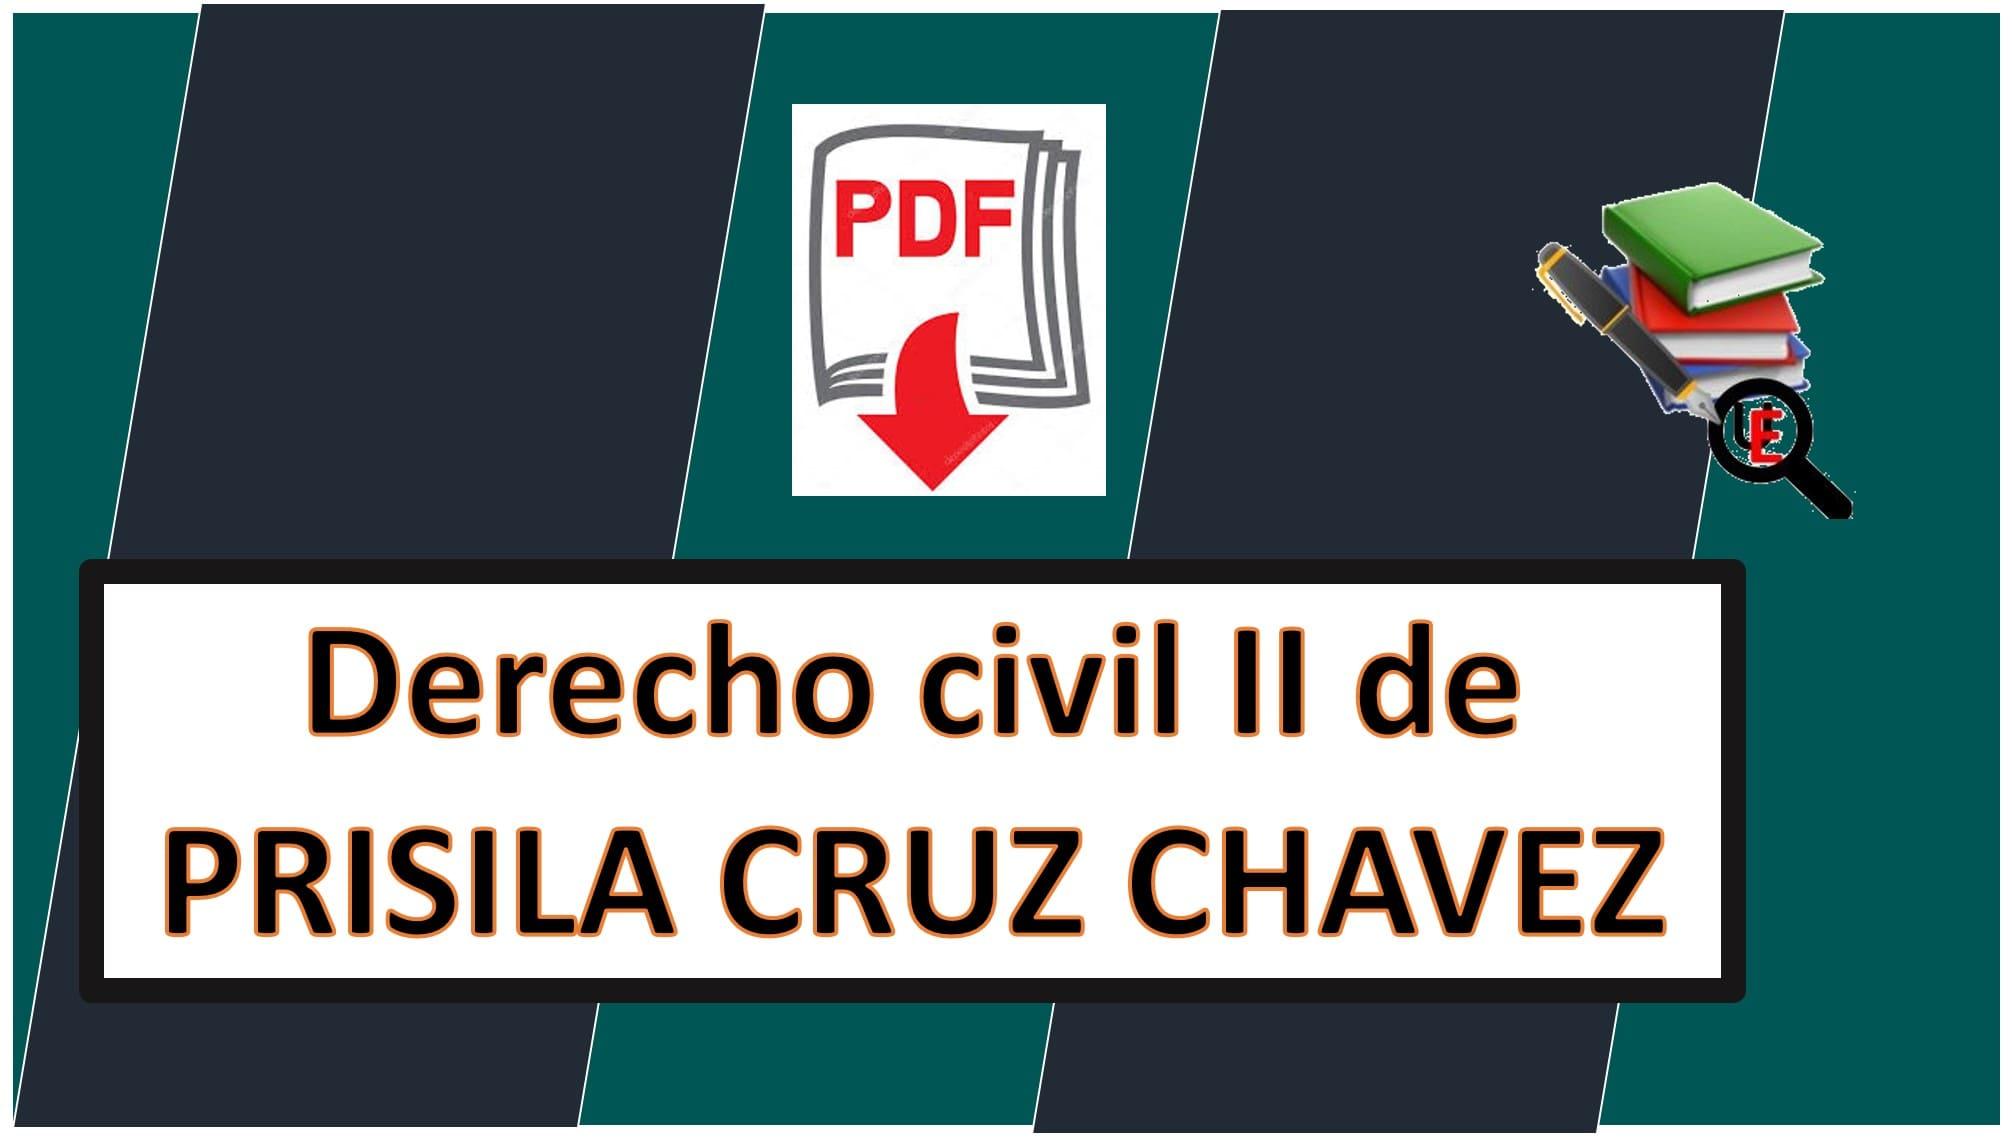 derecho civil 2 pdf